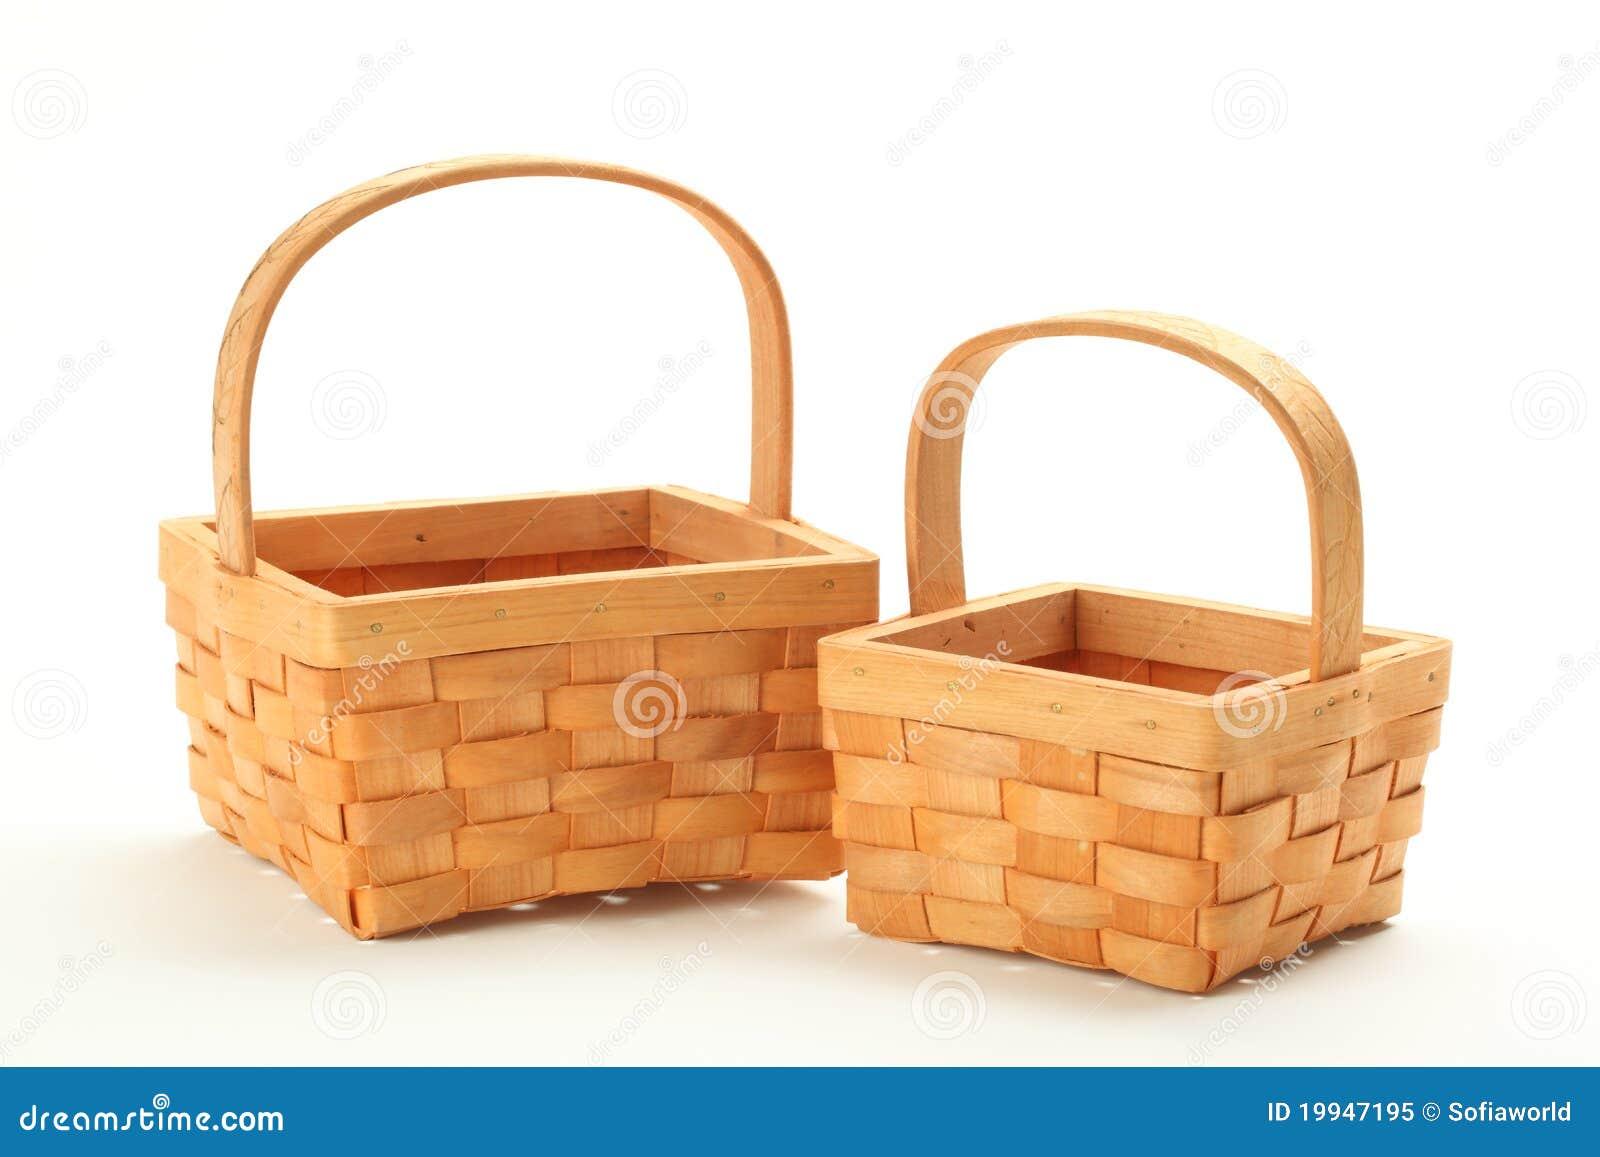 Small Wicker Basket Royalty Free Stock Photo Image 19947195